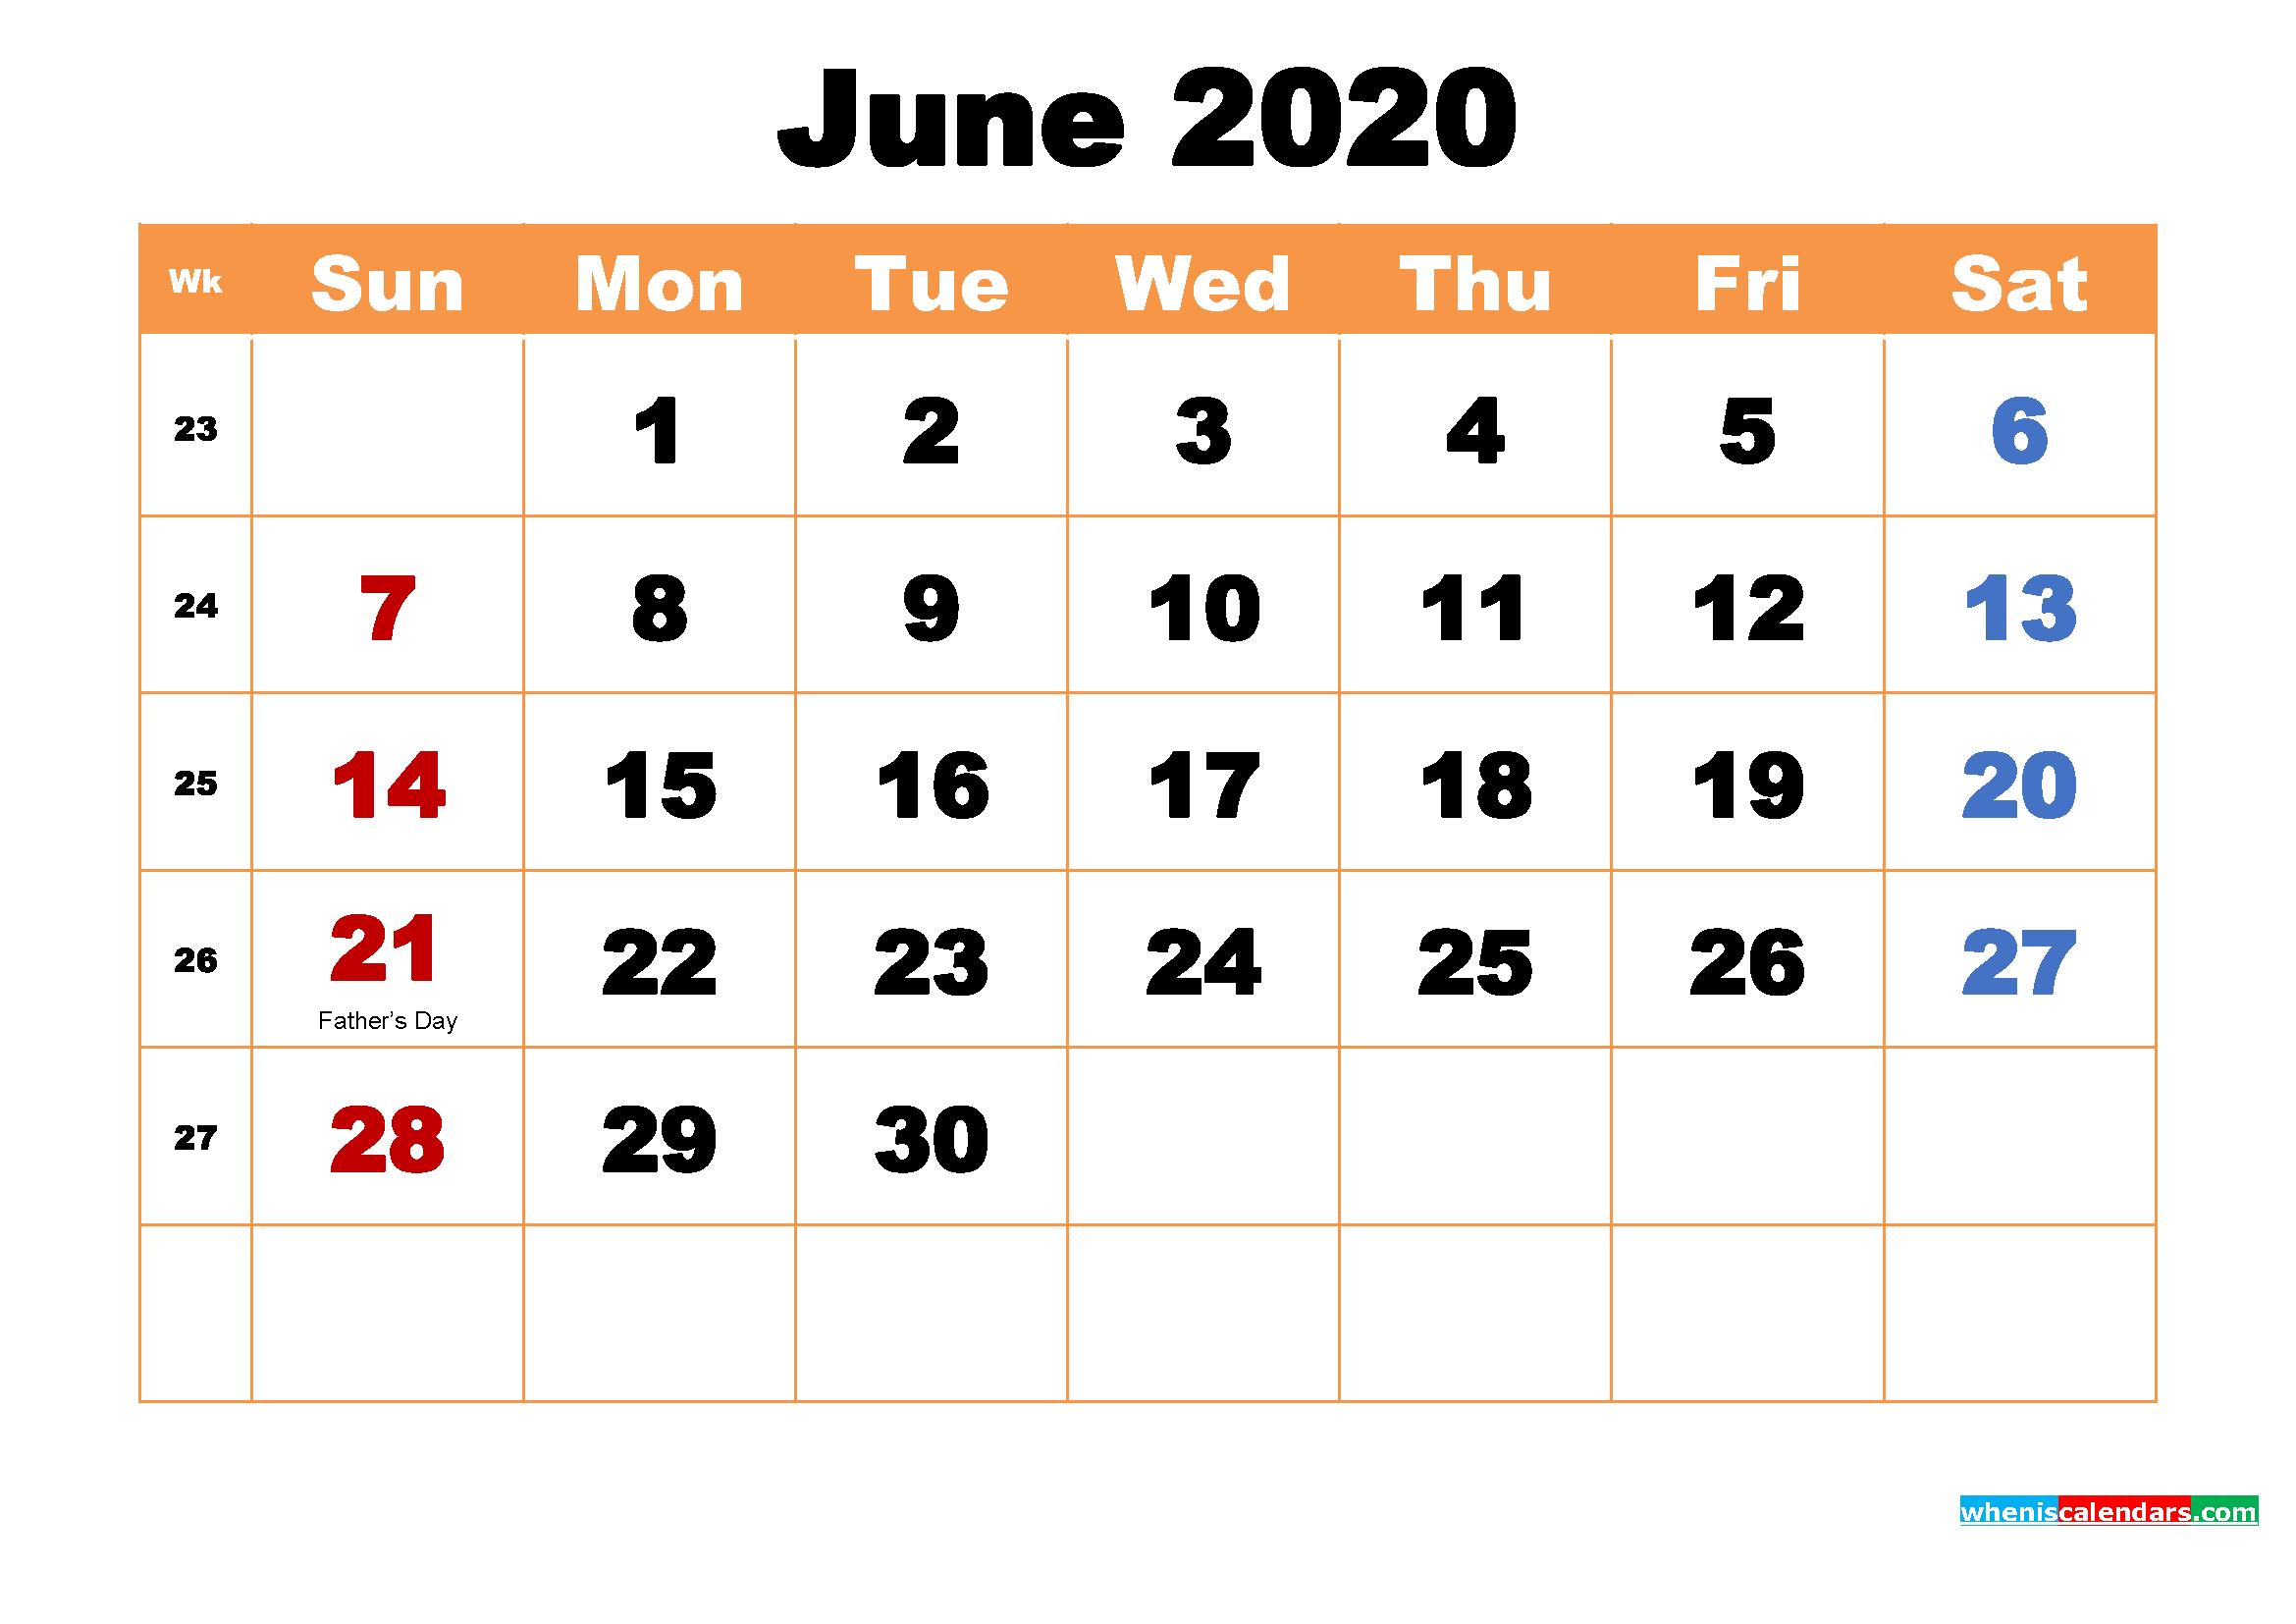 Printable Calendar for June 2020